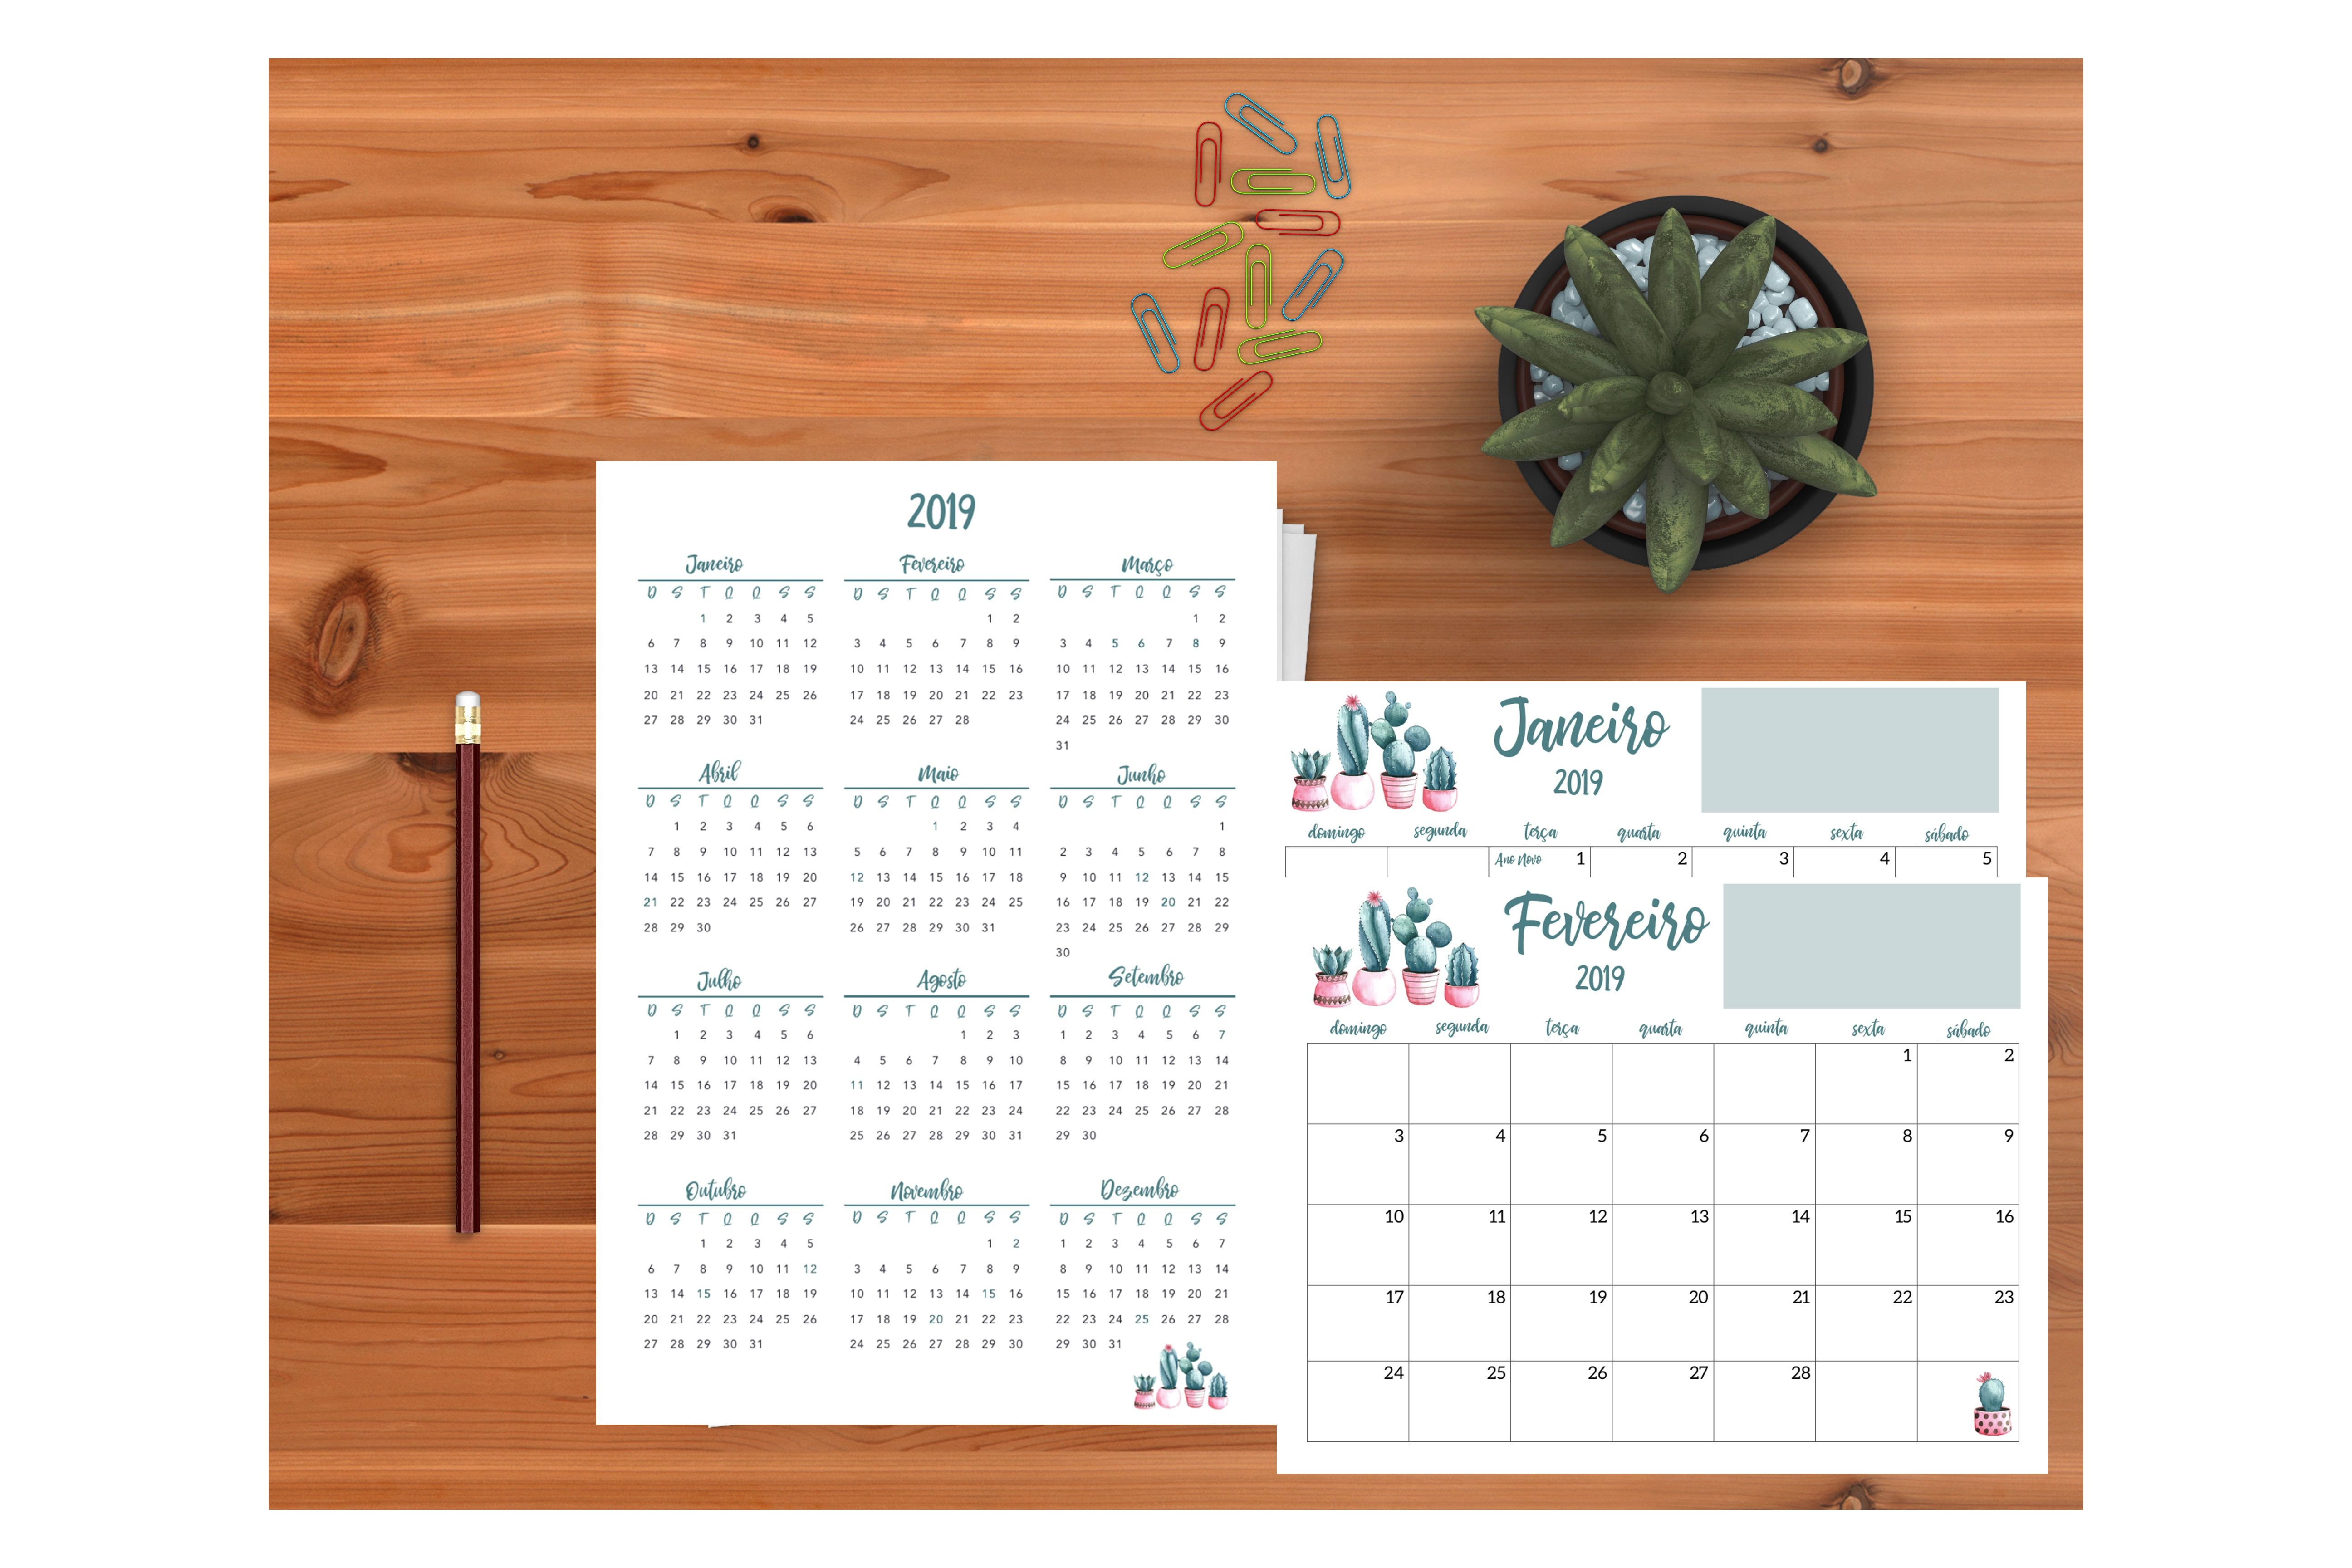 Calendario De Outubro 2017 Para Imprimir Más Recientemente Liberado Planner 2019 Calendário Cactos Pdf Feriados Nacionais Datas Of Calendario De Outubro 2017 Para Imprimir Más Caliente Pin De Flora Las Em Printable Pinterest